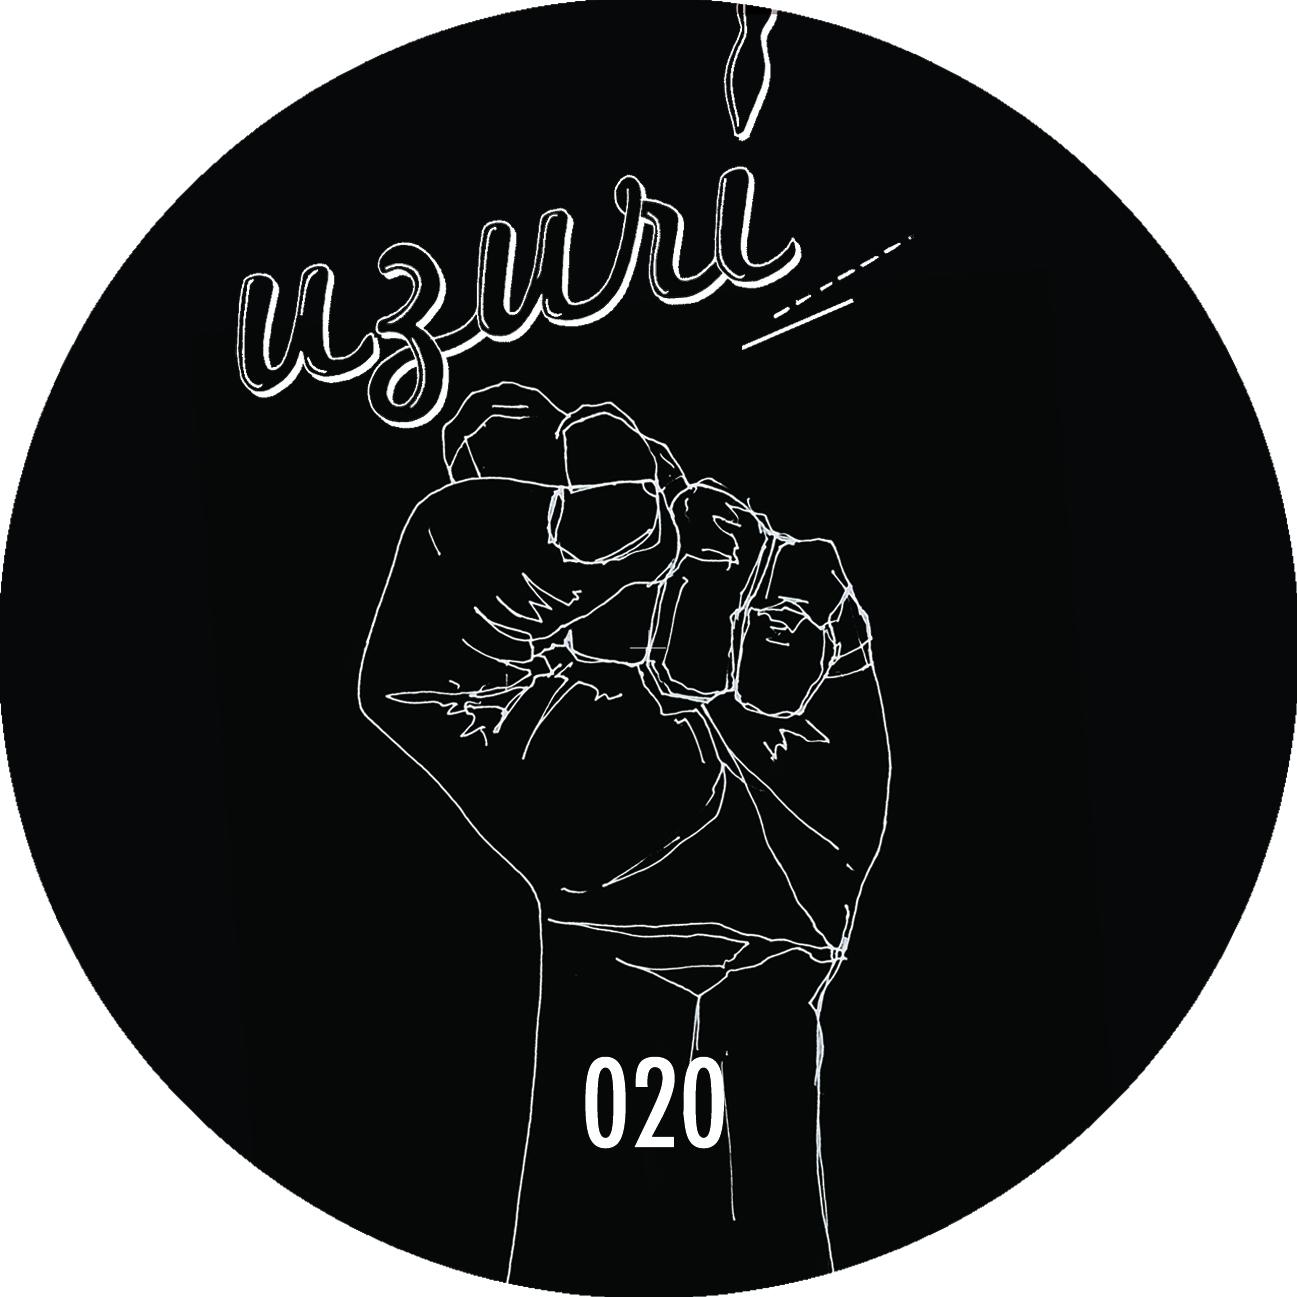 Jitterbug – Workers EP (Uzuri)